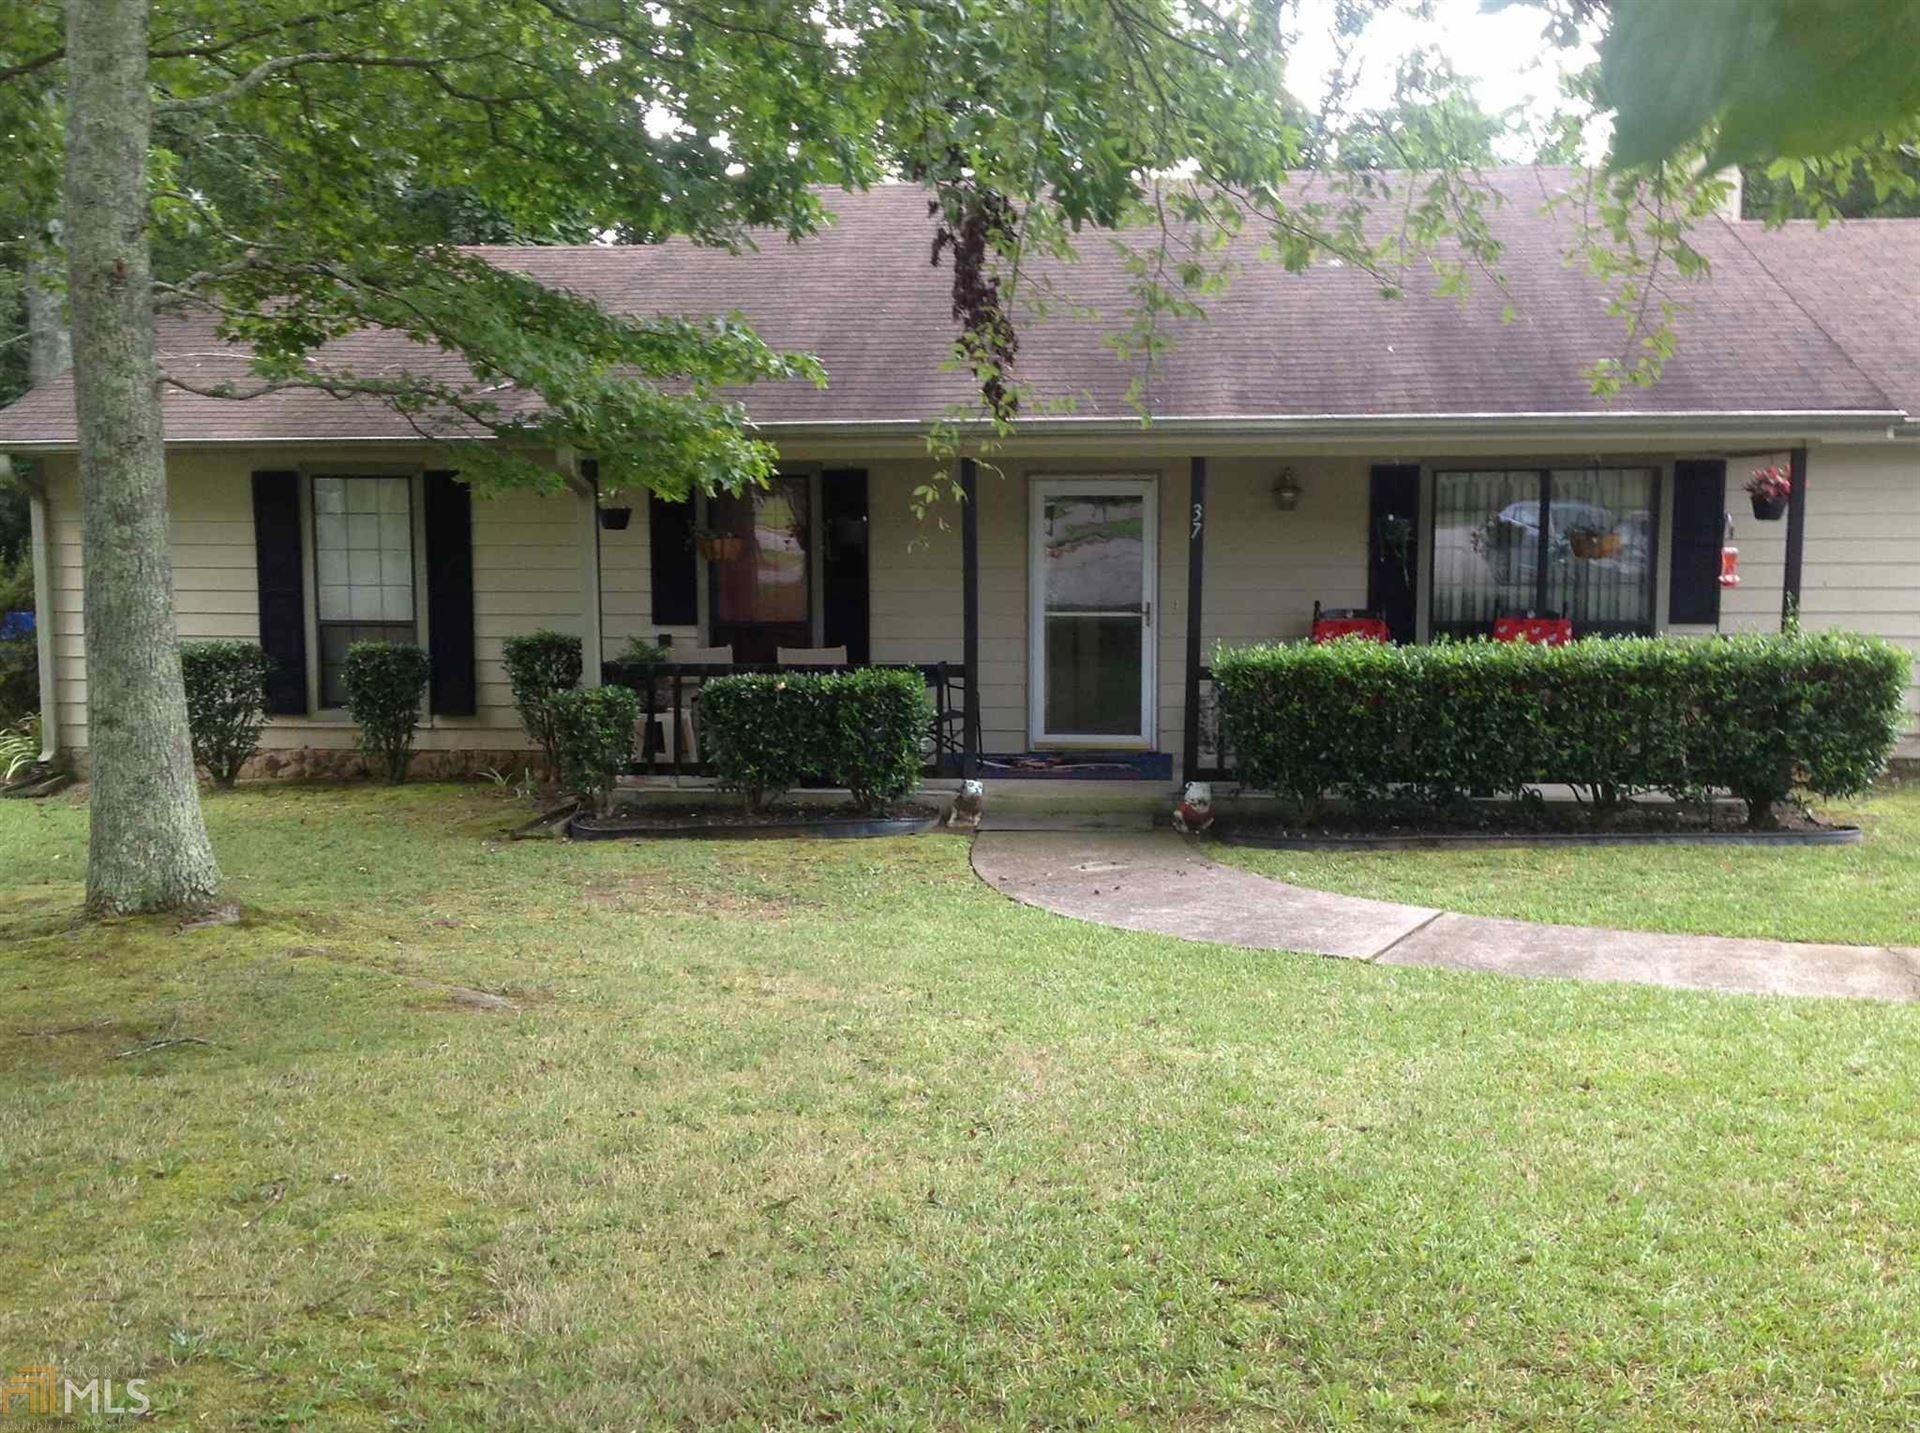 37 White Breeze, Stockbridge, GA 30281 - MLS#: 8855007